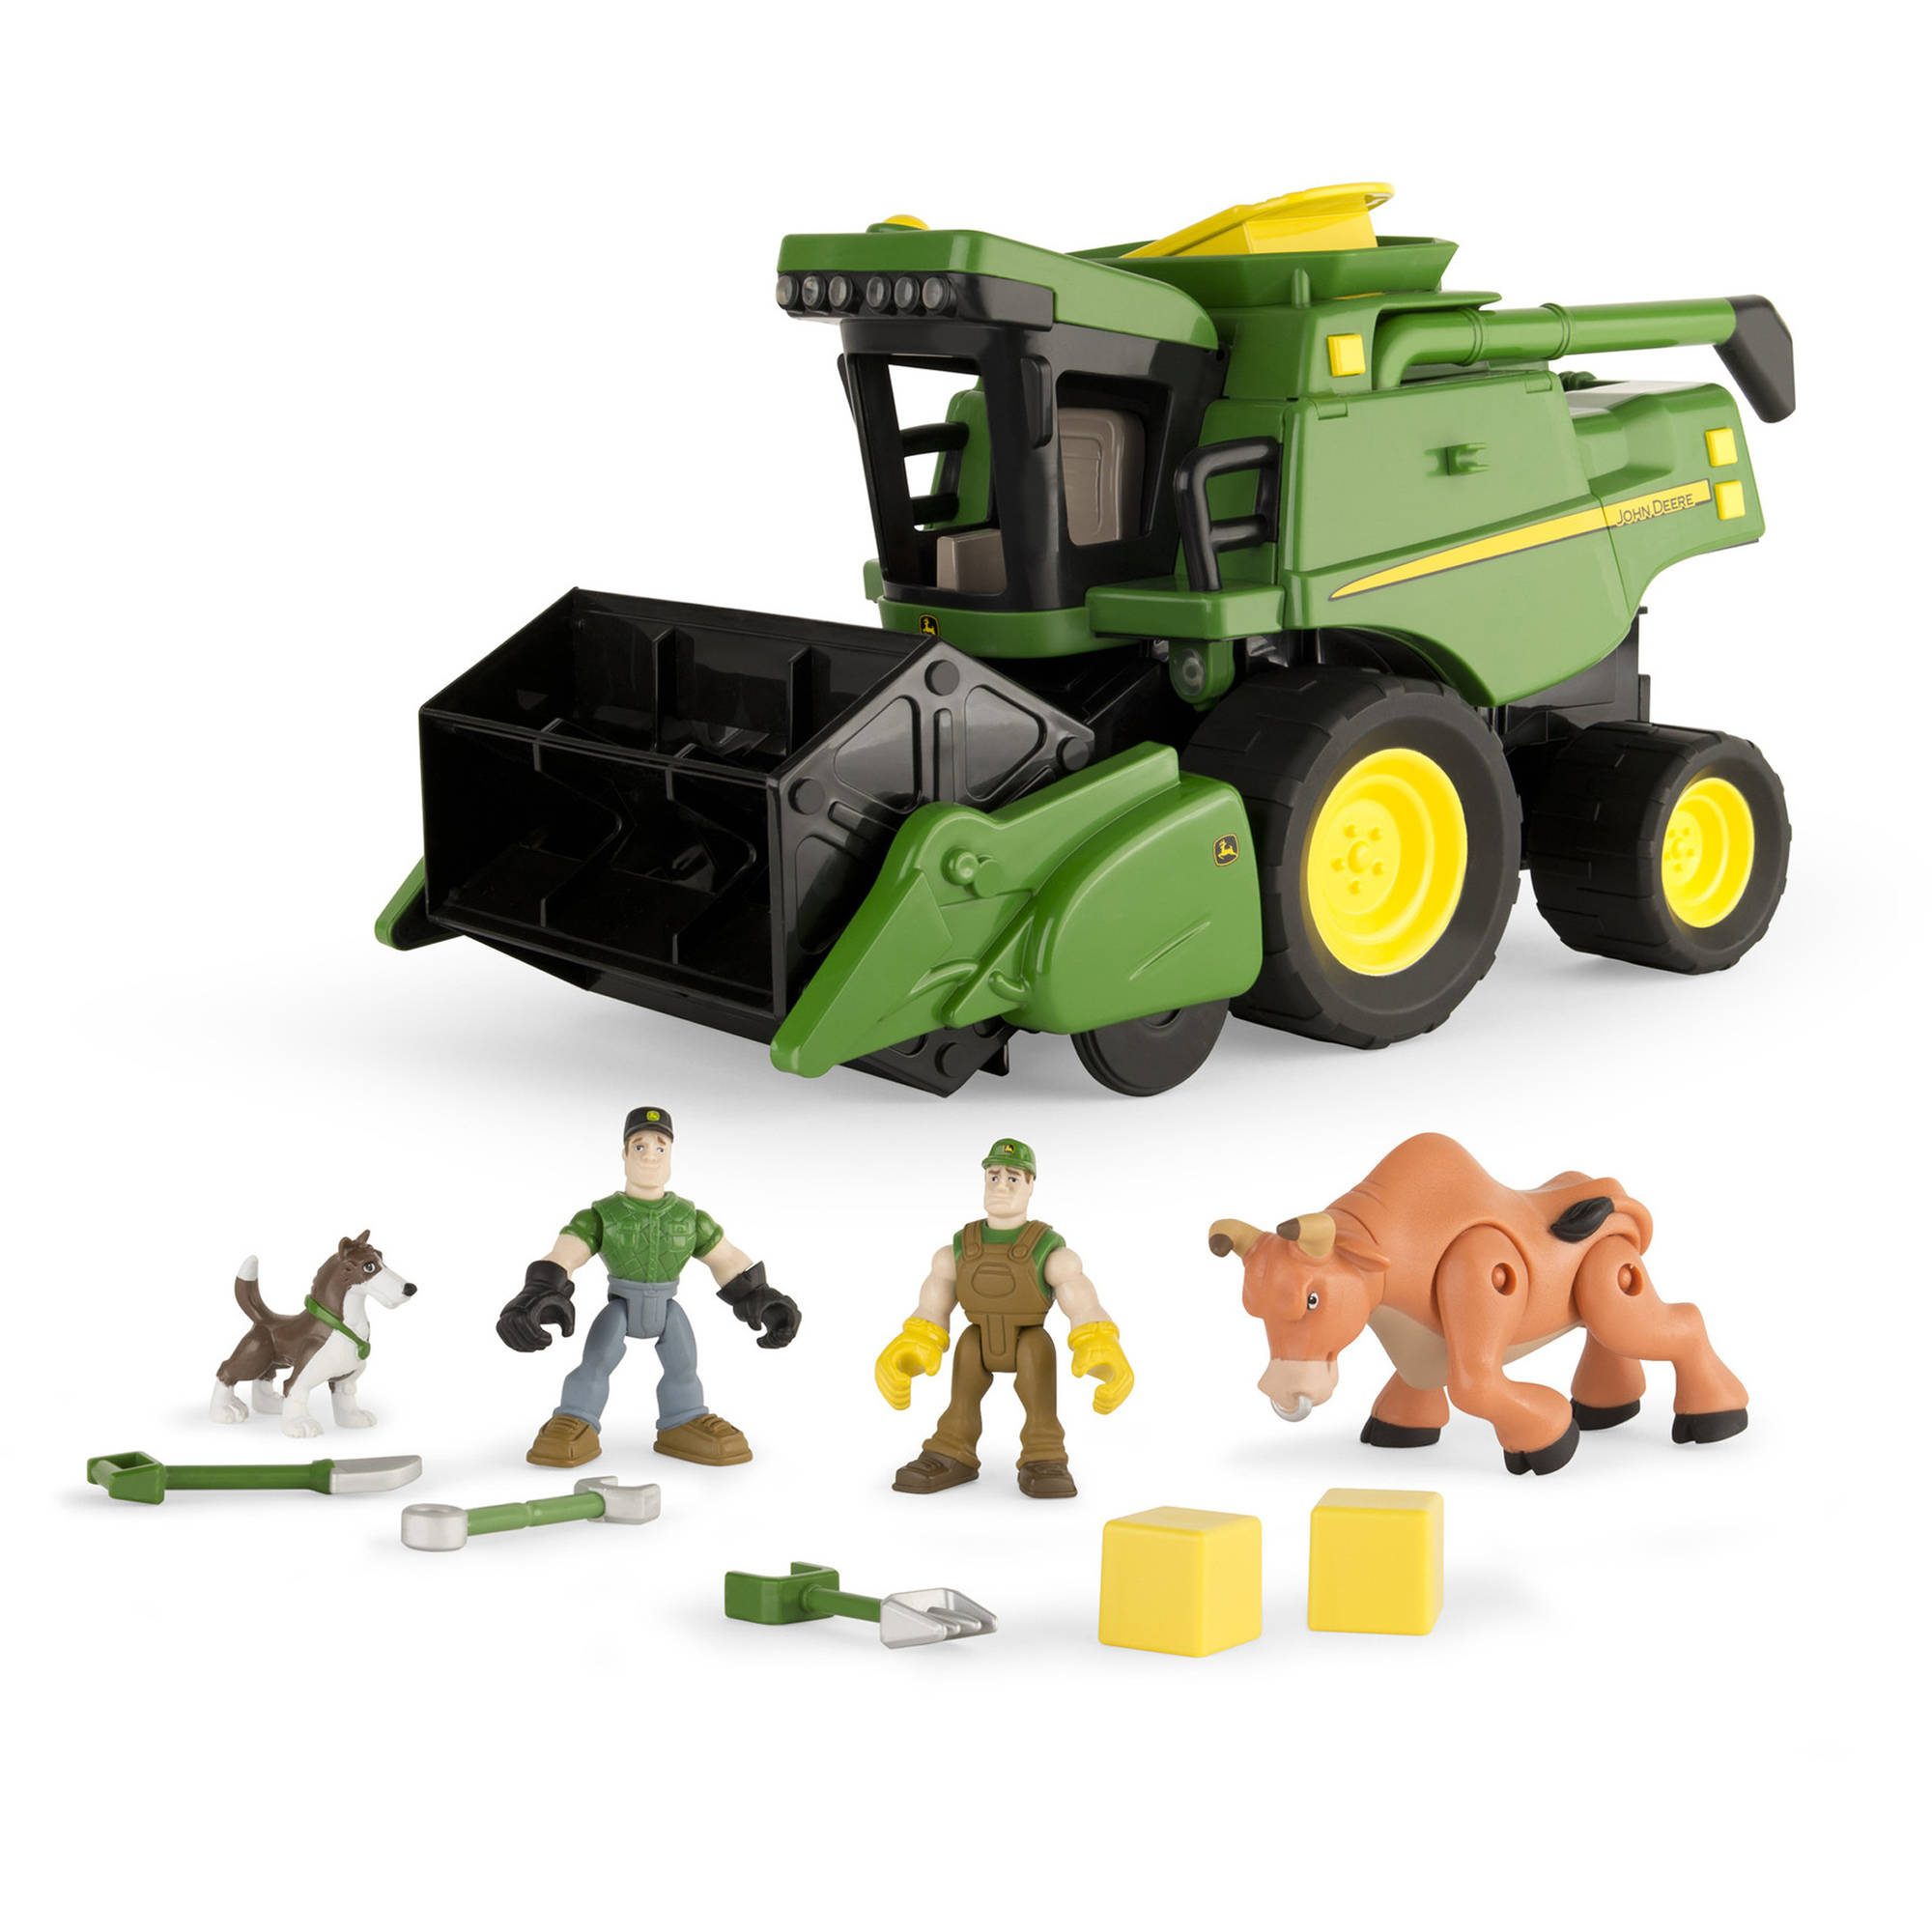 John Deere Gear Force Combine Harvester Play Set